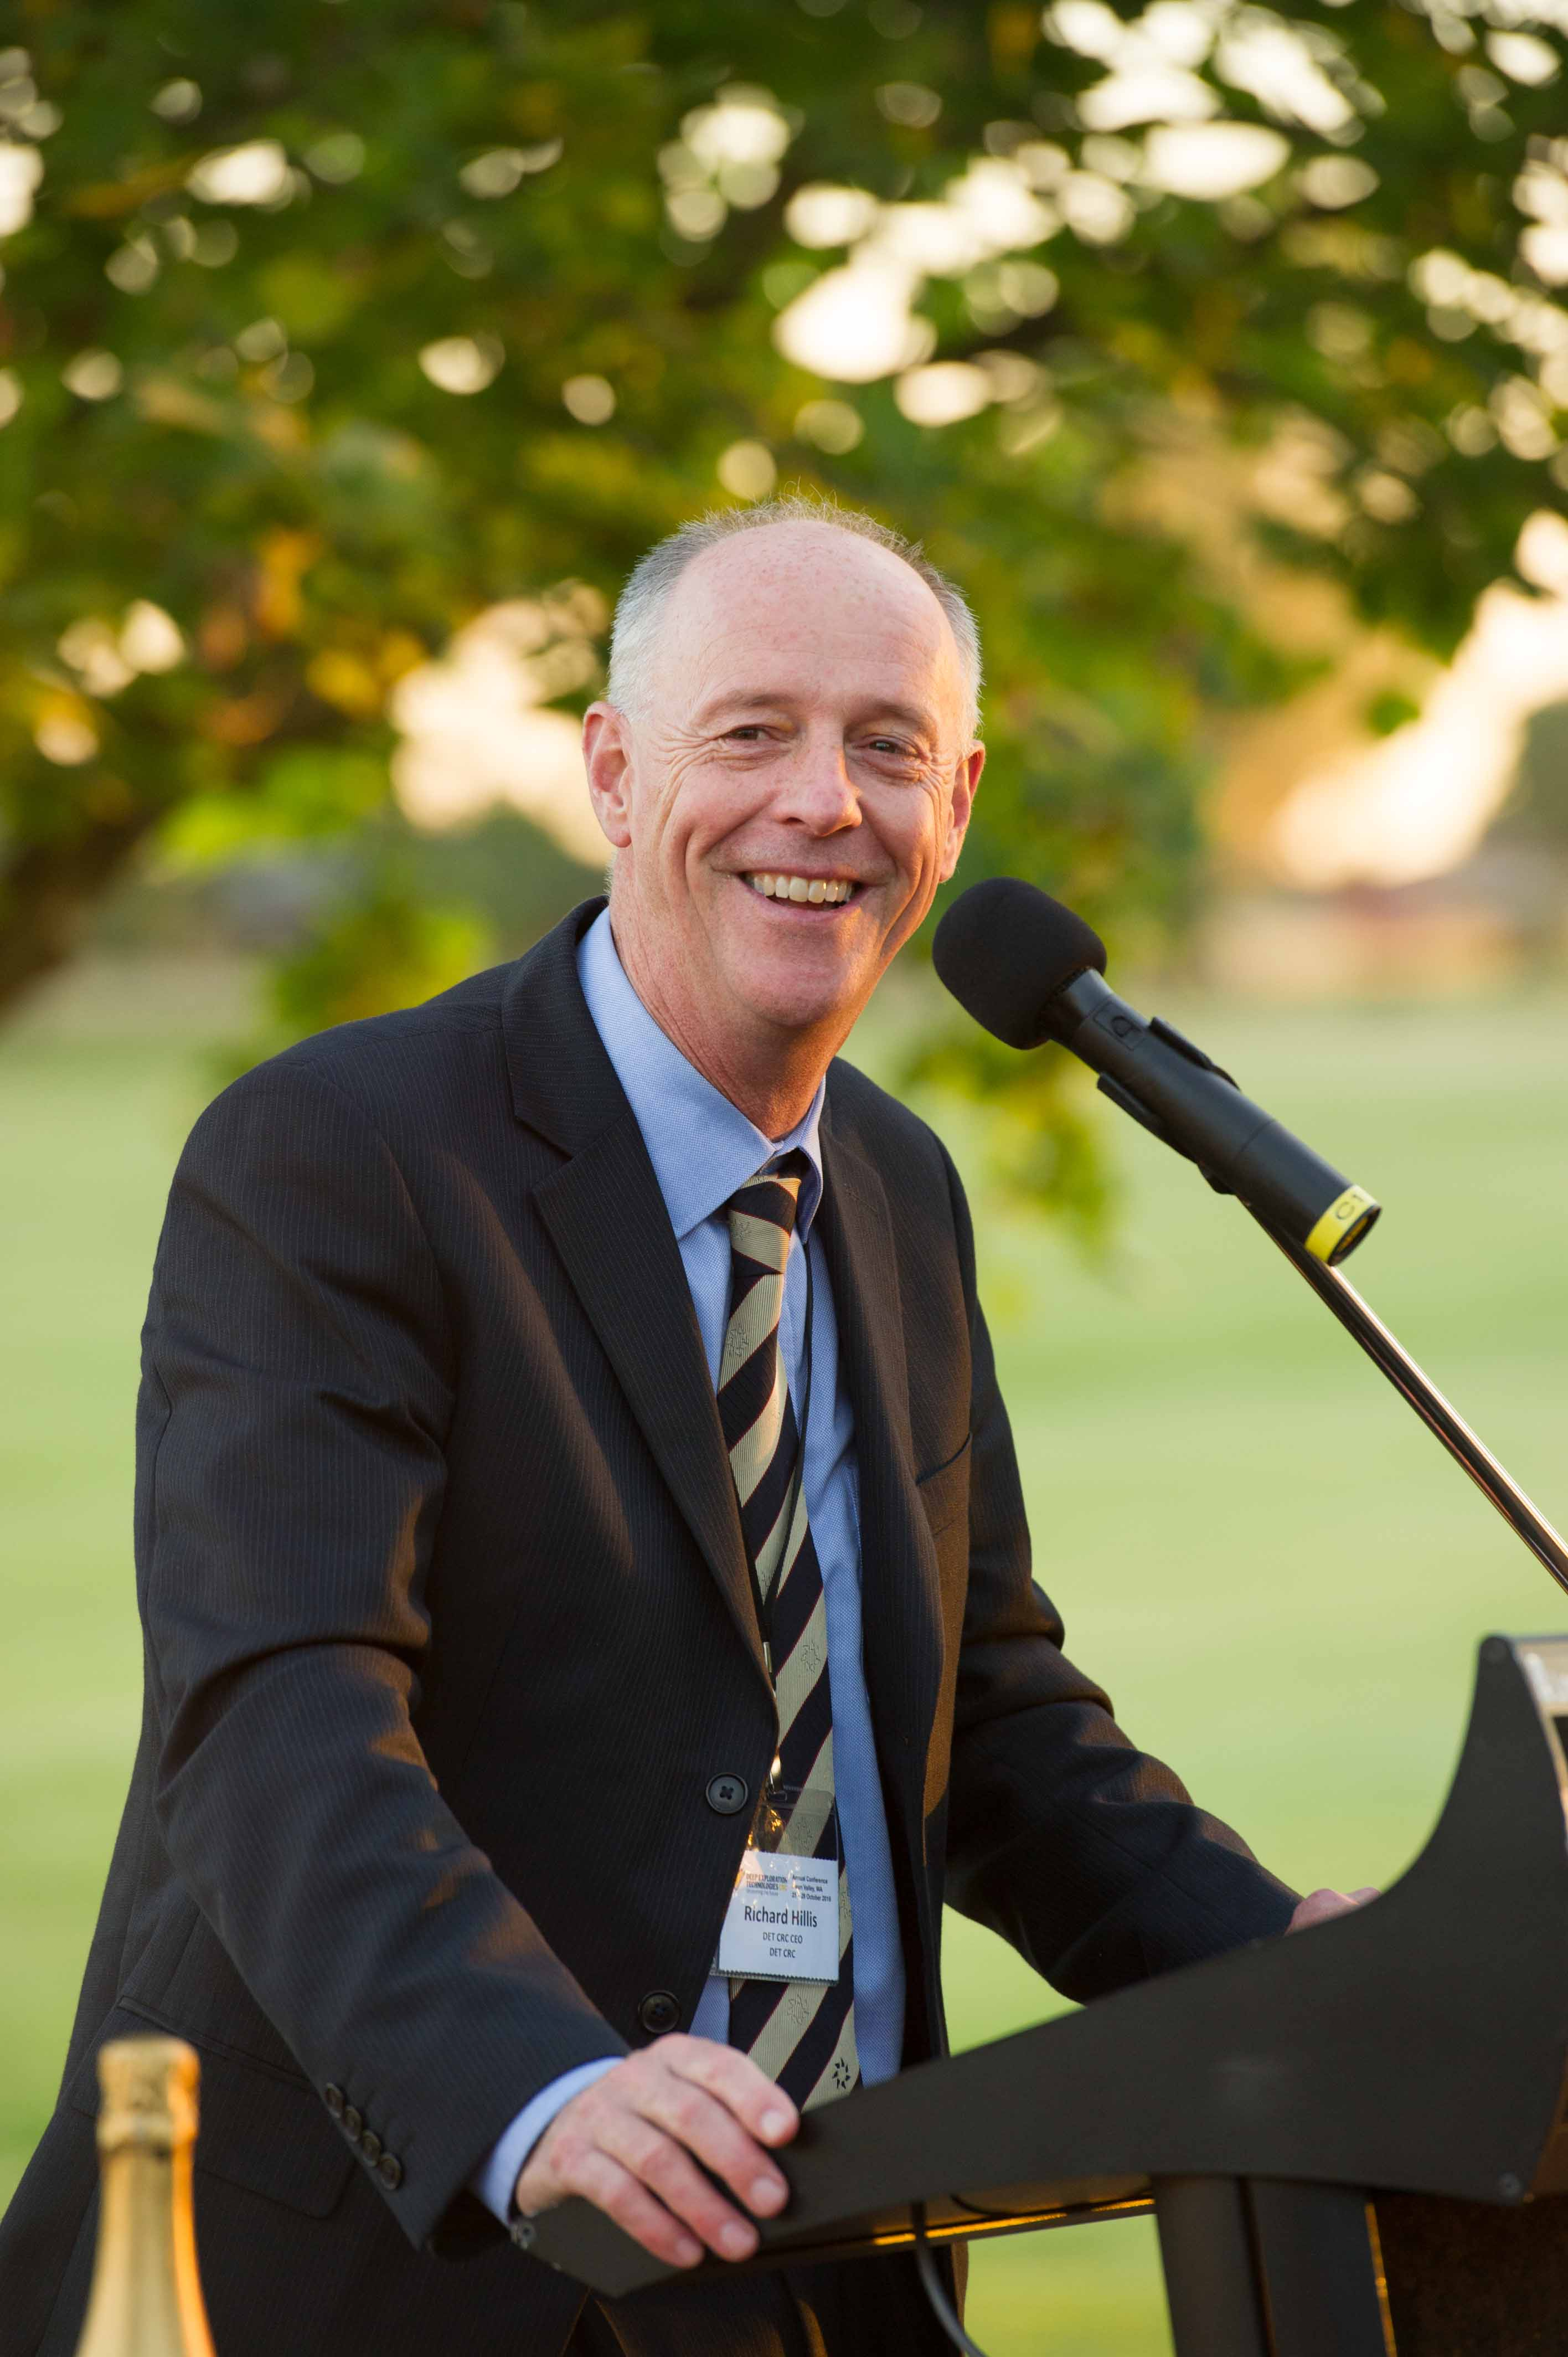 Dr Richard Hillis